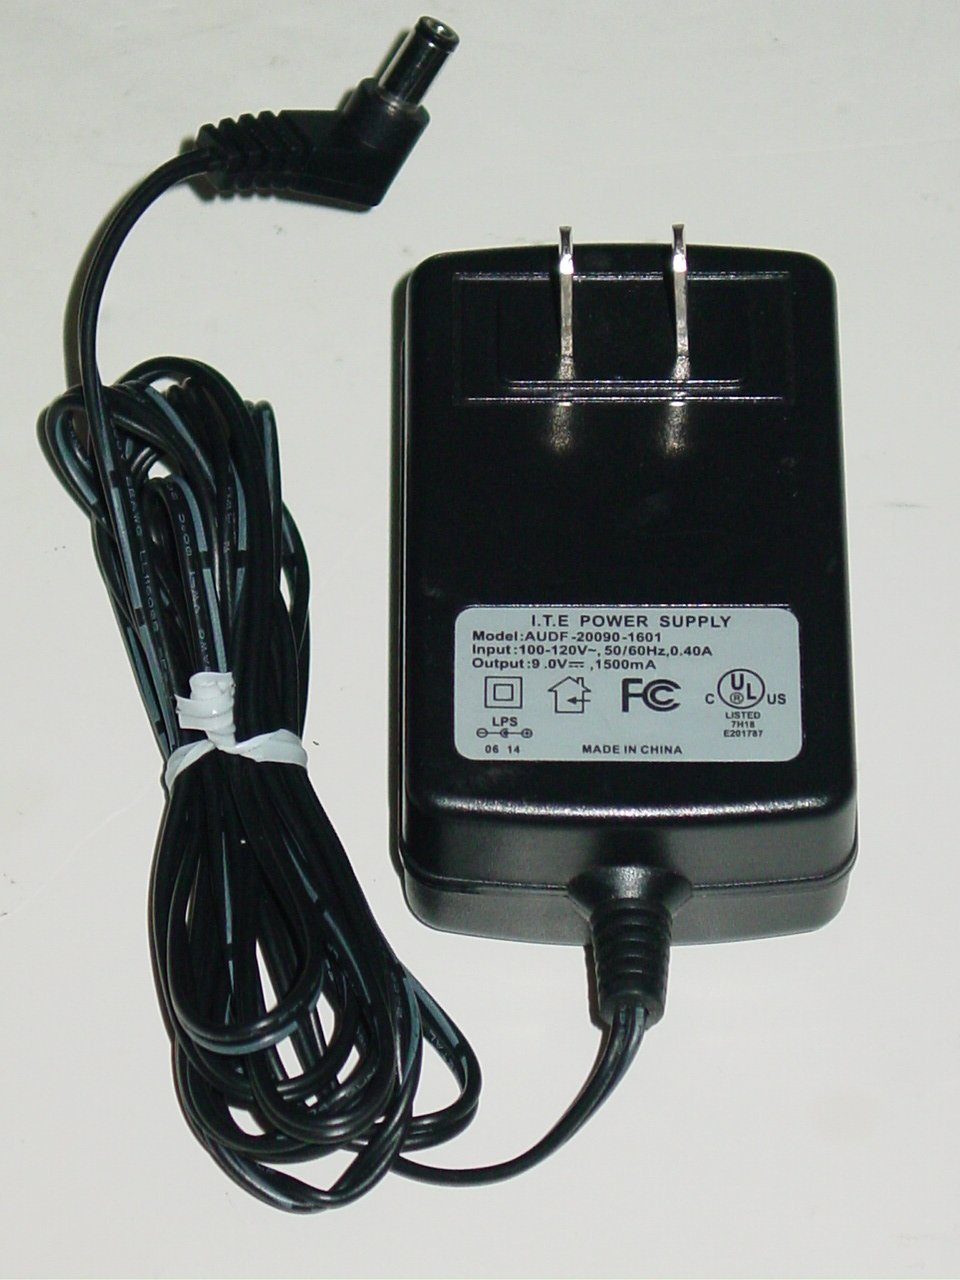 I.T.E AUDF-20090-1601 AC Adapter 15V 3A